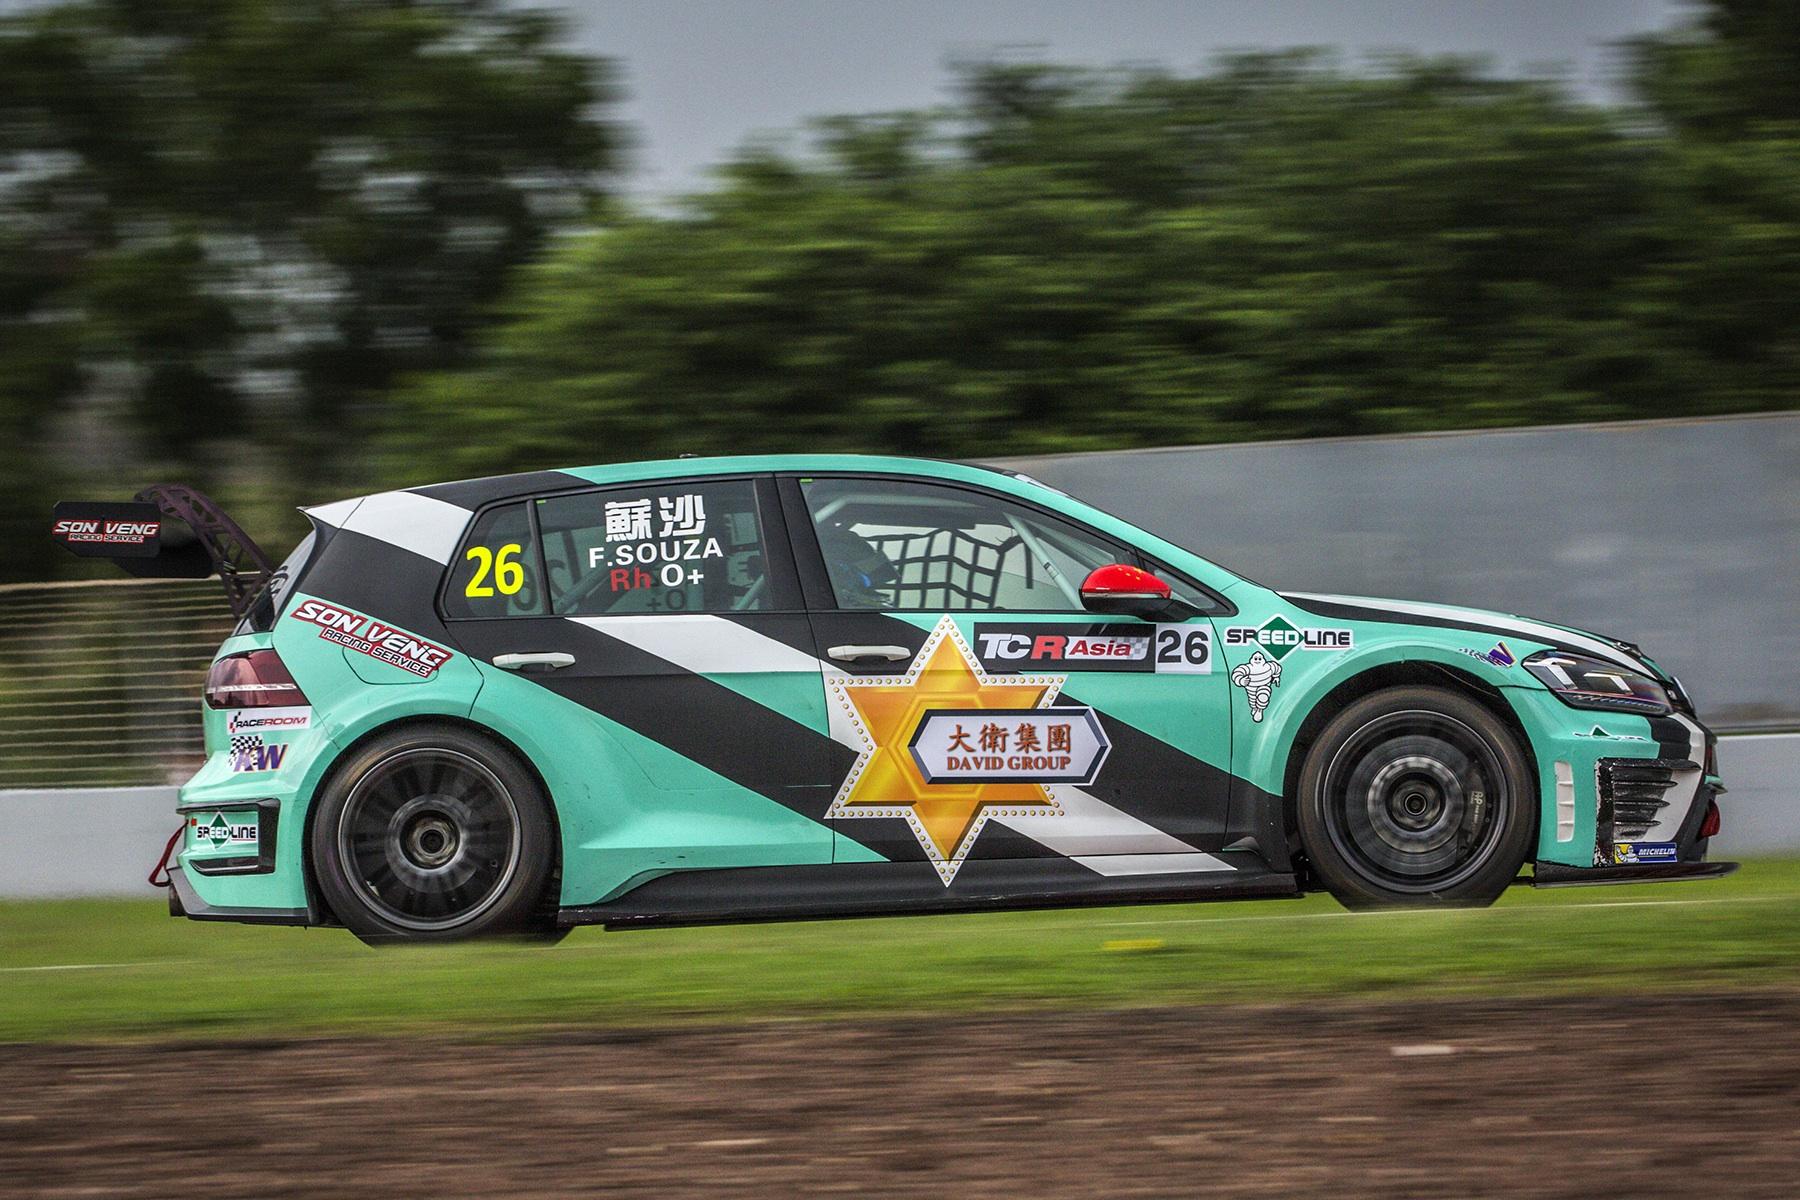 Automobilismo | Filipe Souza obtém segundo lugar na TCR Asia Series